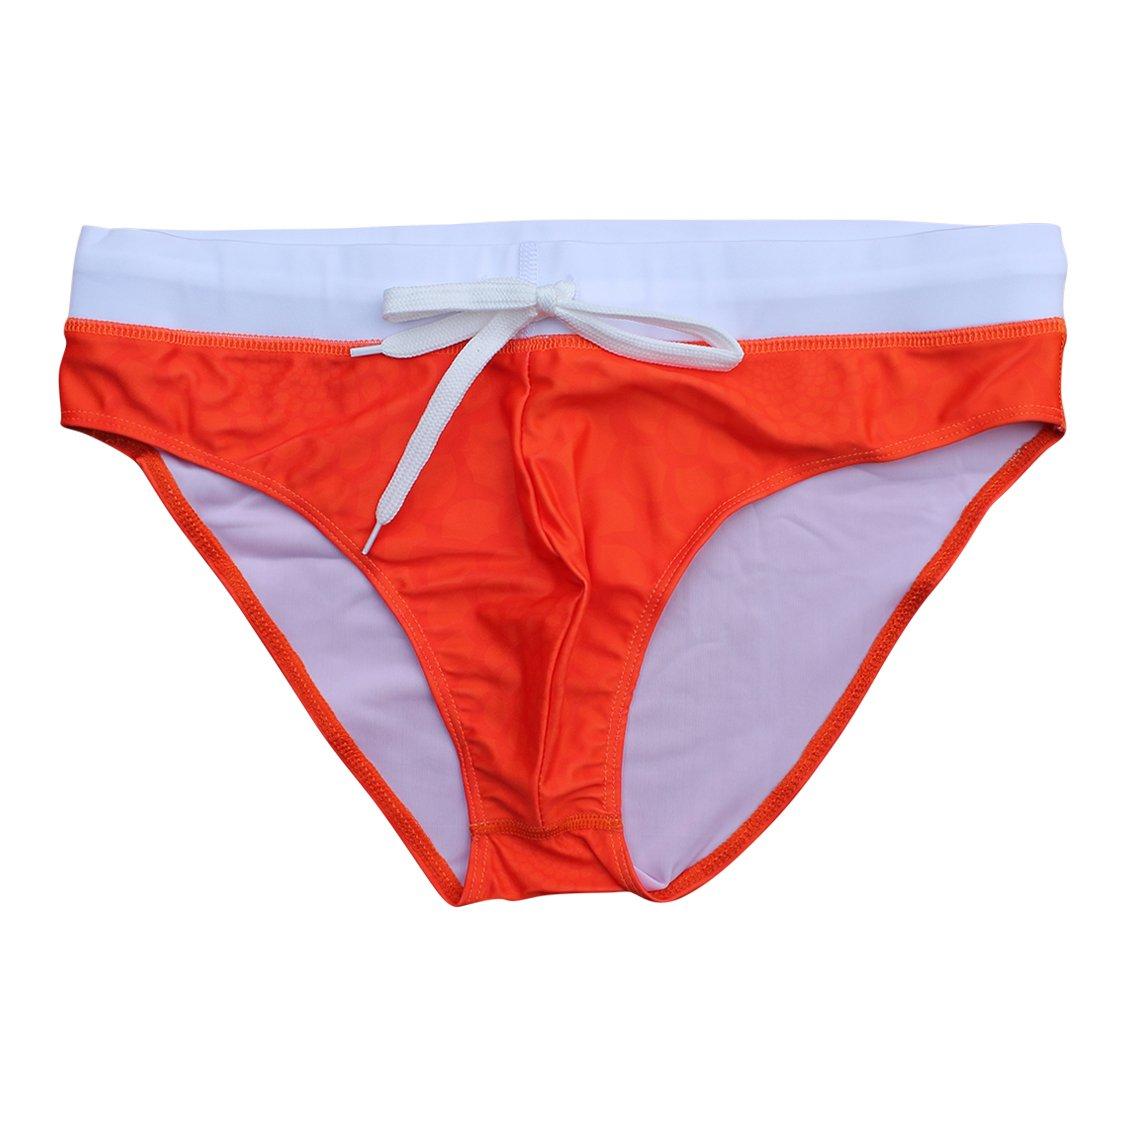 5TH INDUSTRY - 20+ Styles - Mens Swim Briefs - Orange Viper - X-Large